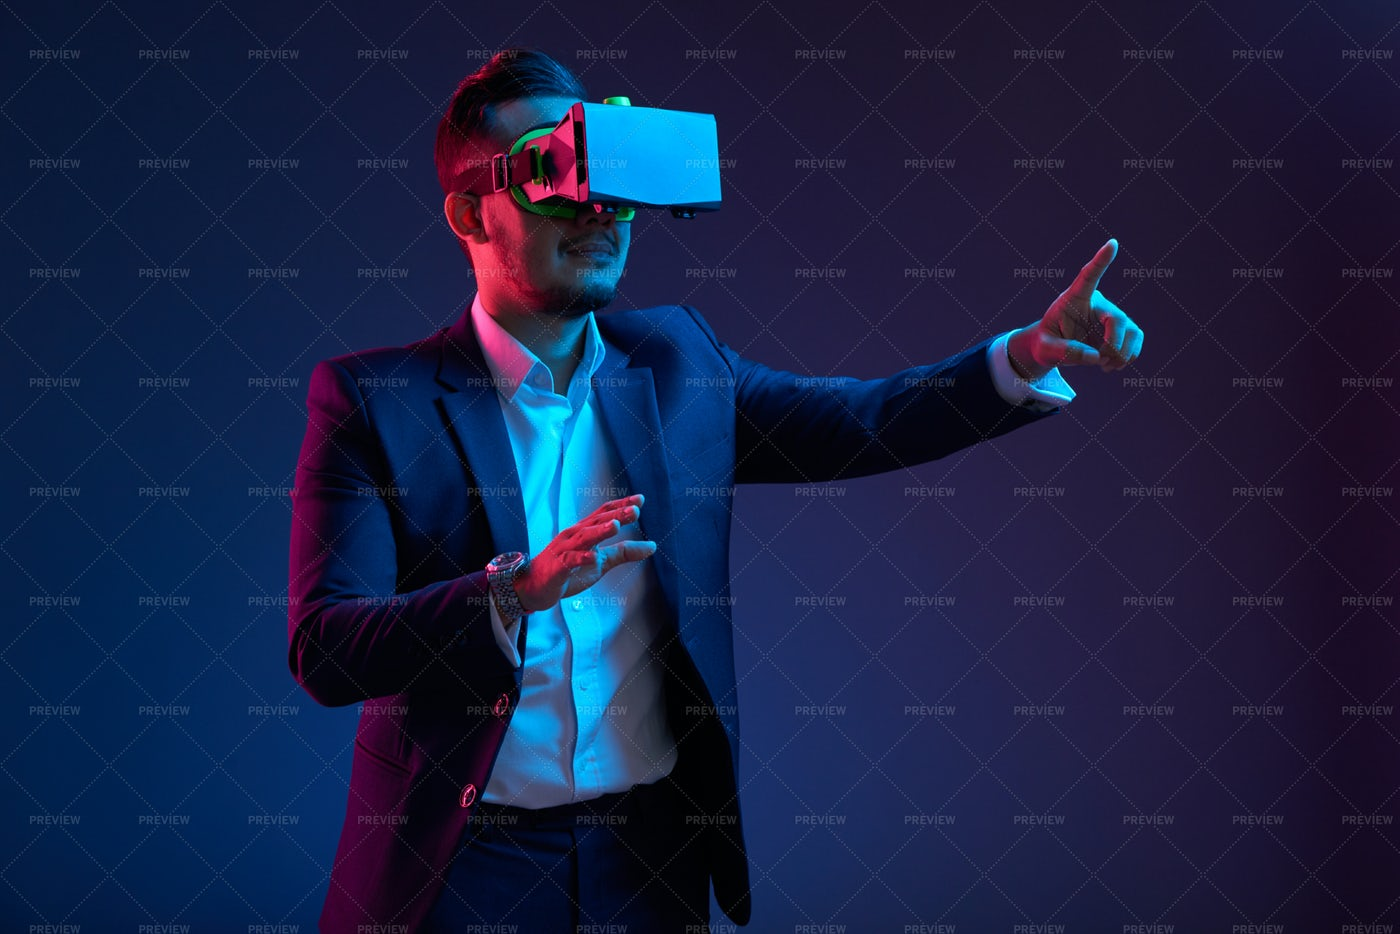 Entrepreneur In Virtual Reality Headse: Stock Photos